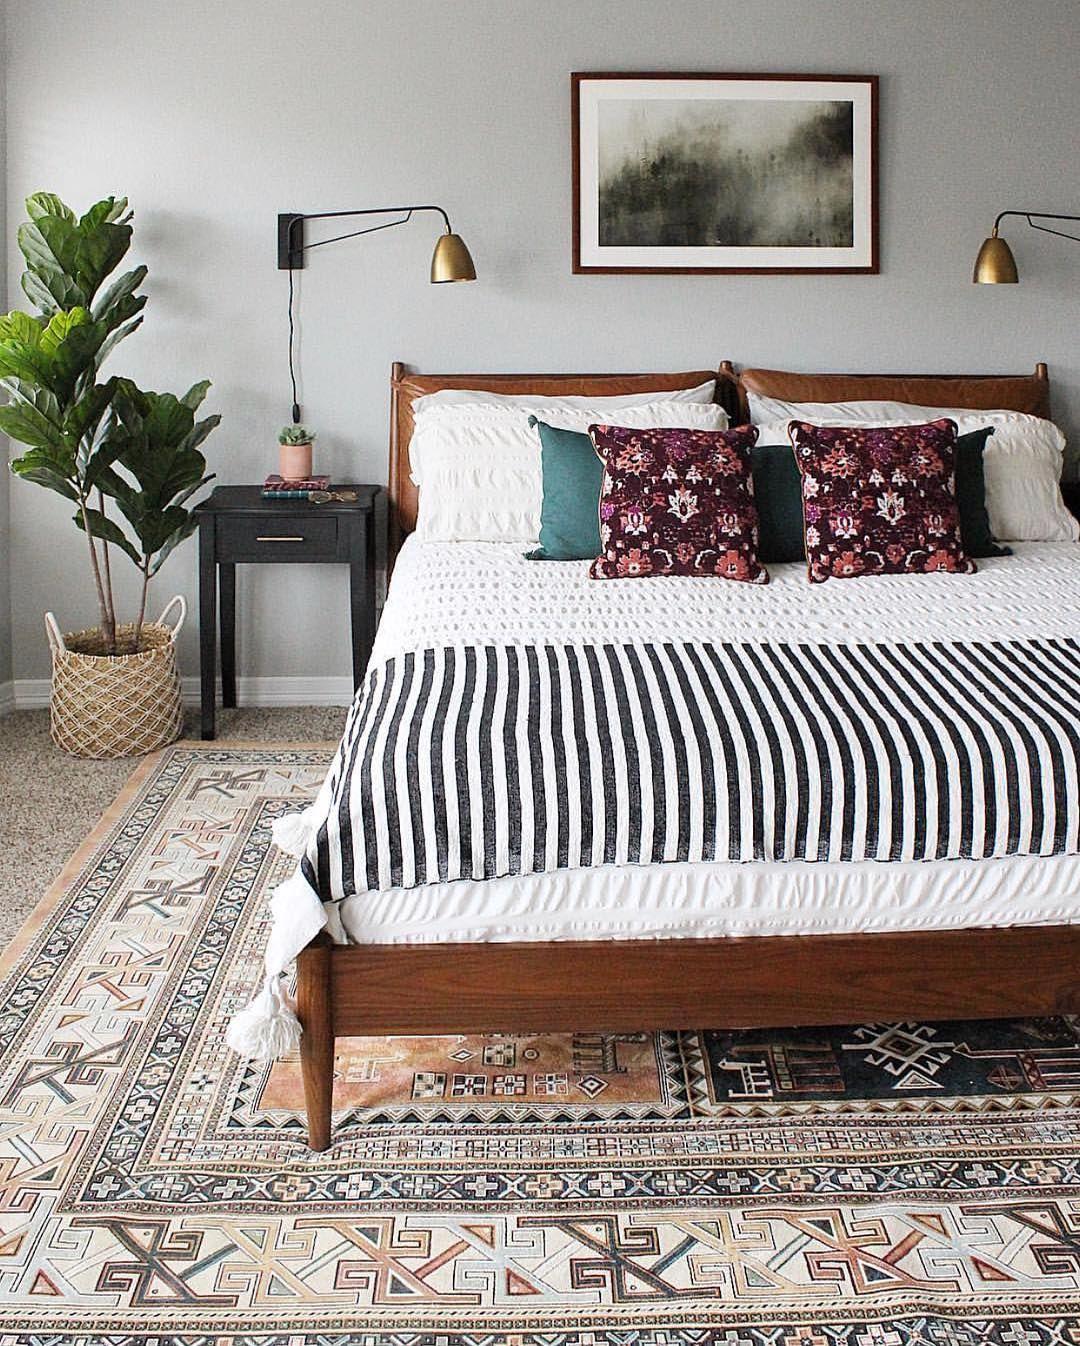 Rustic Furniture Juniper Bed Rustic Bedroom Furniture Rustic